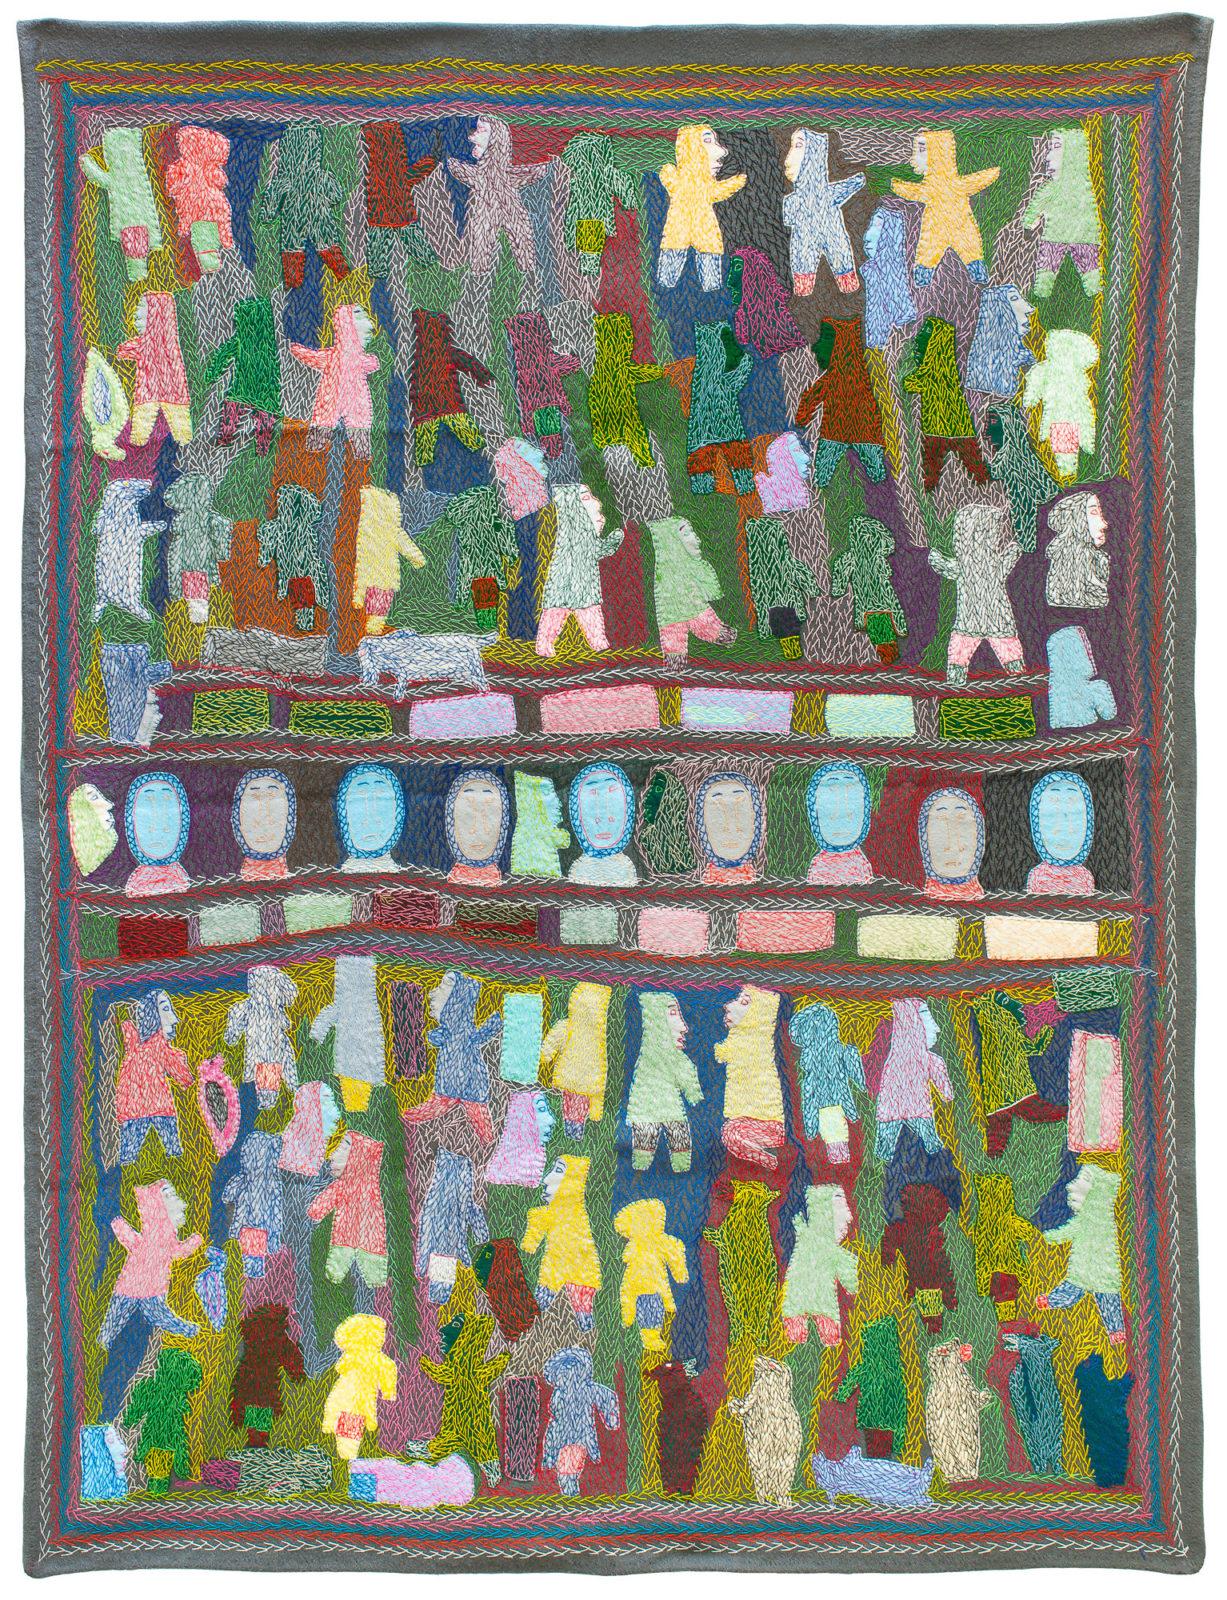 Annie Taipanak - untitled (community)